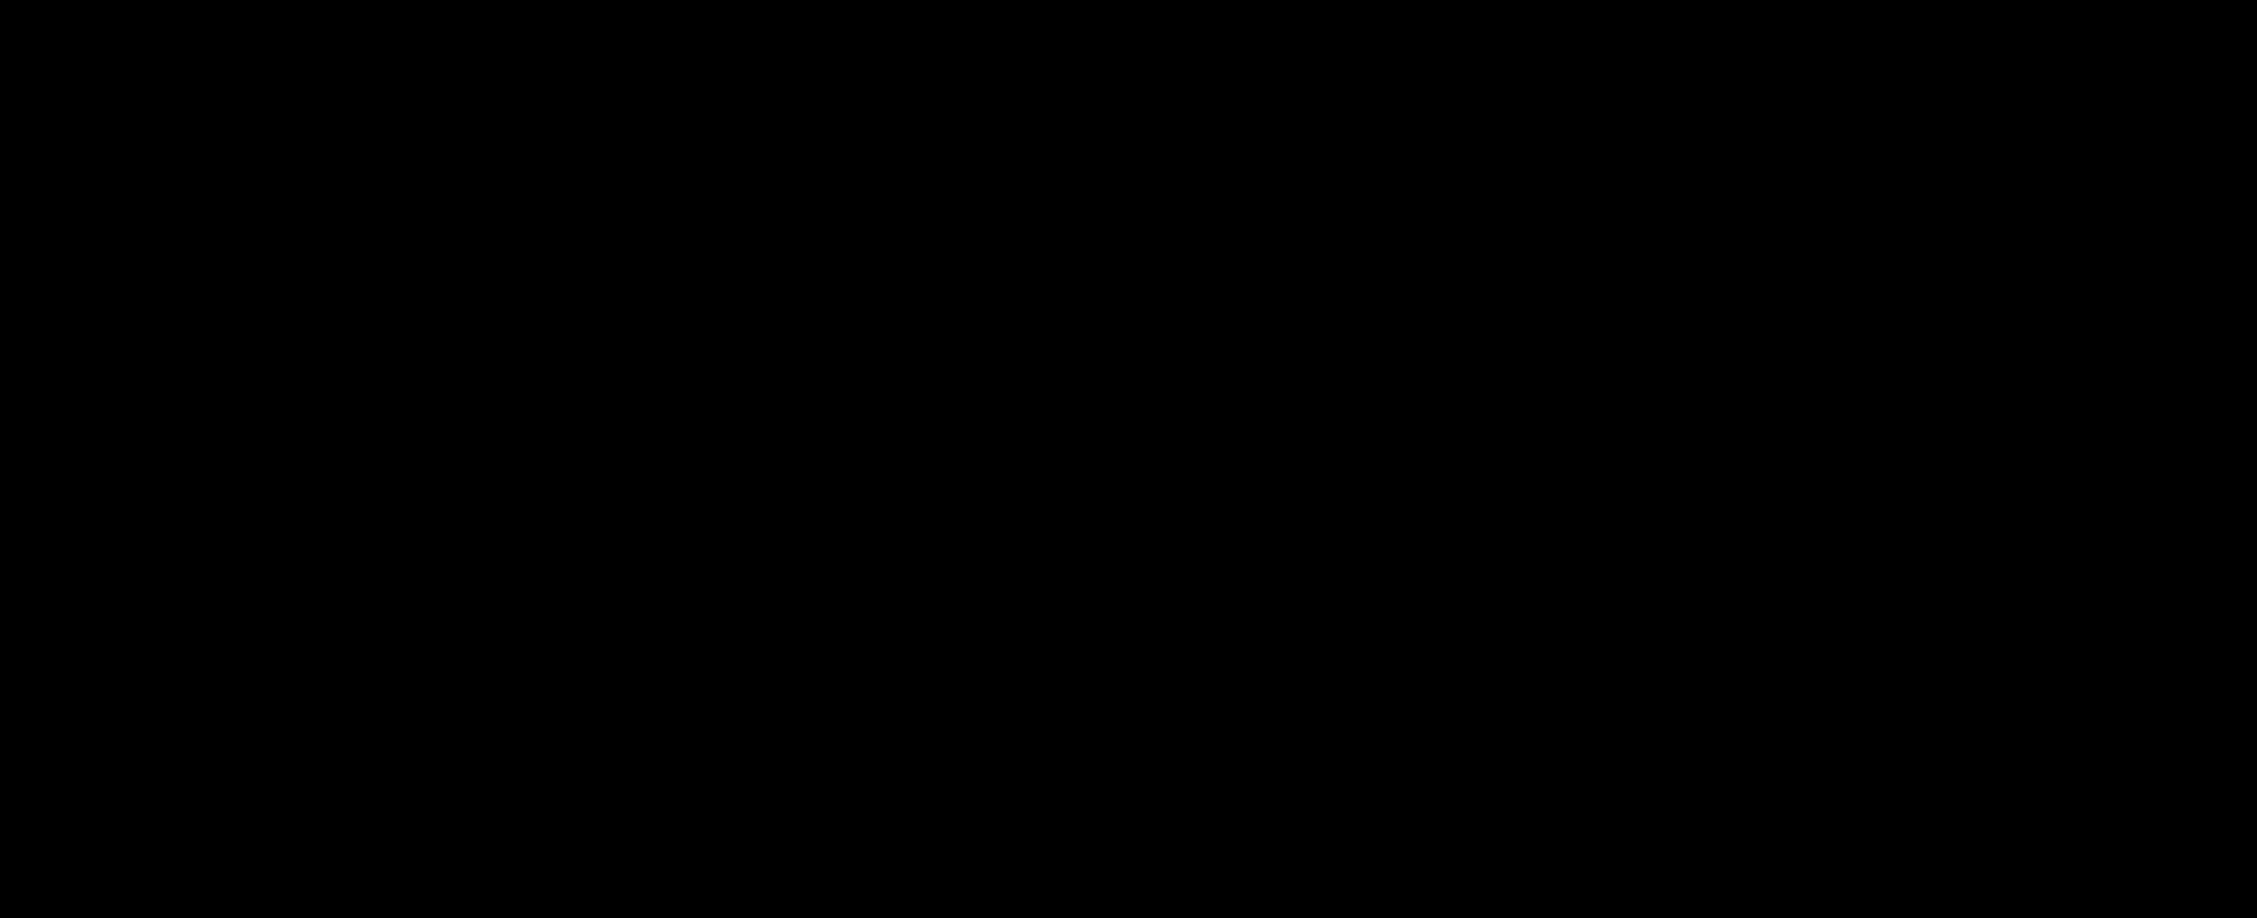 4-(4-Hydroxy-3-methoxy-<sup>13</sup>C, d<sub>3</sub>-benzylidene)curcumin